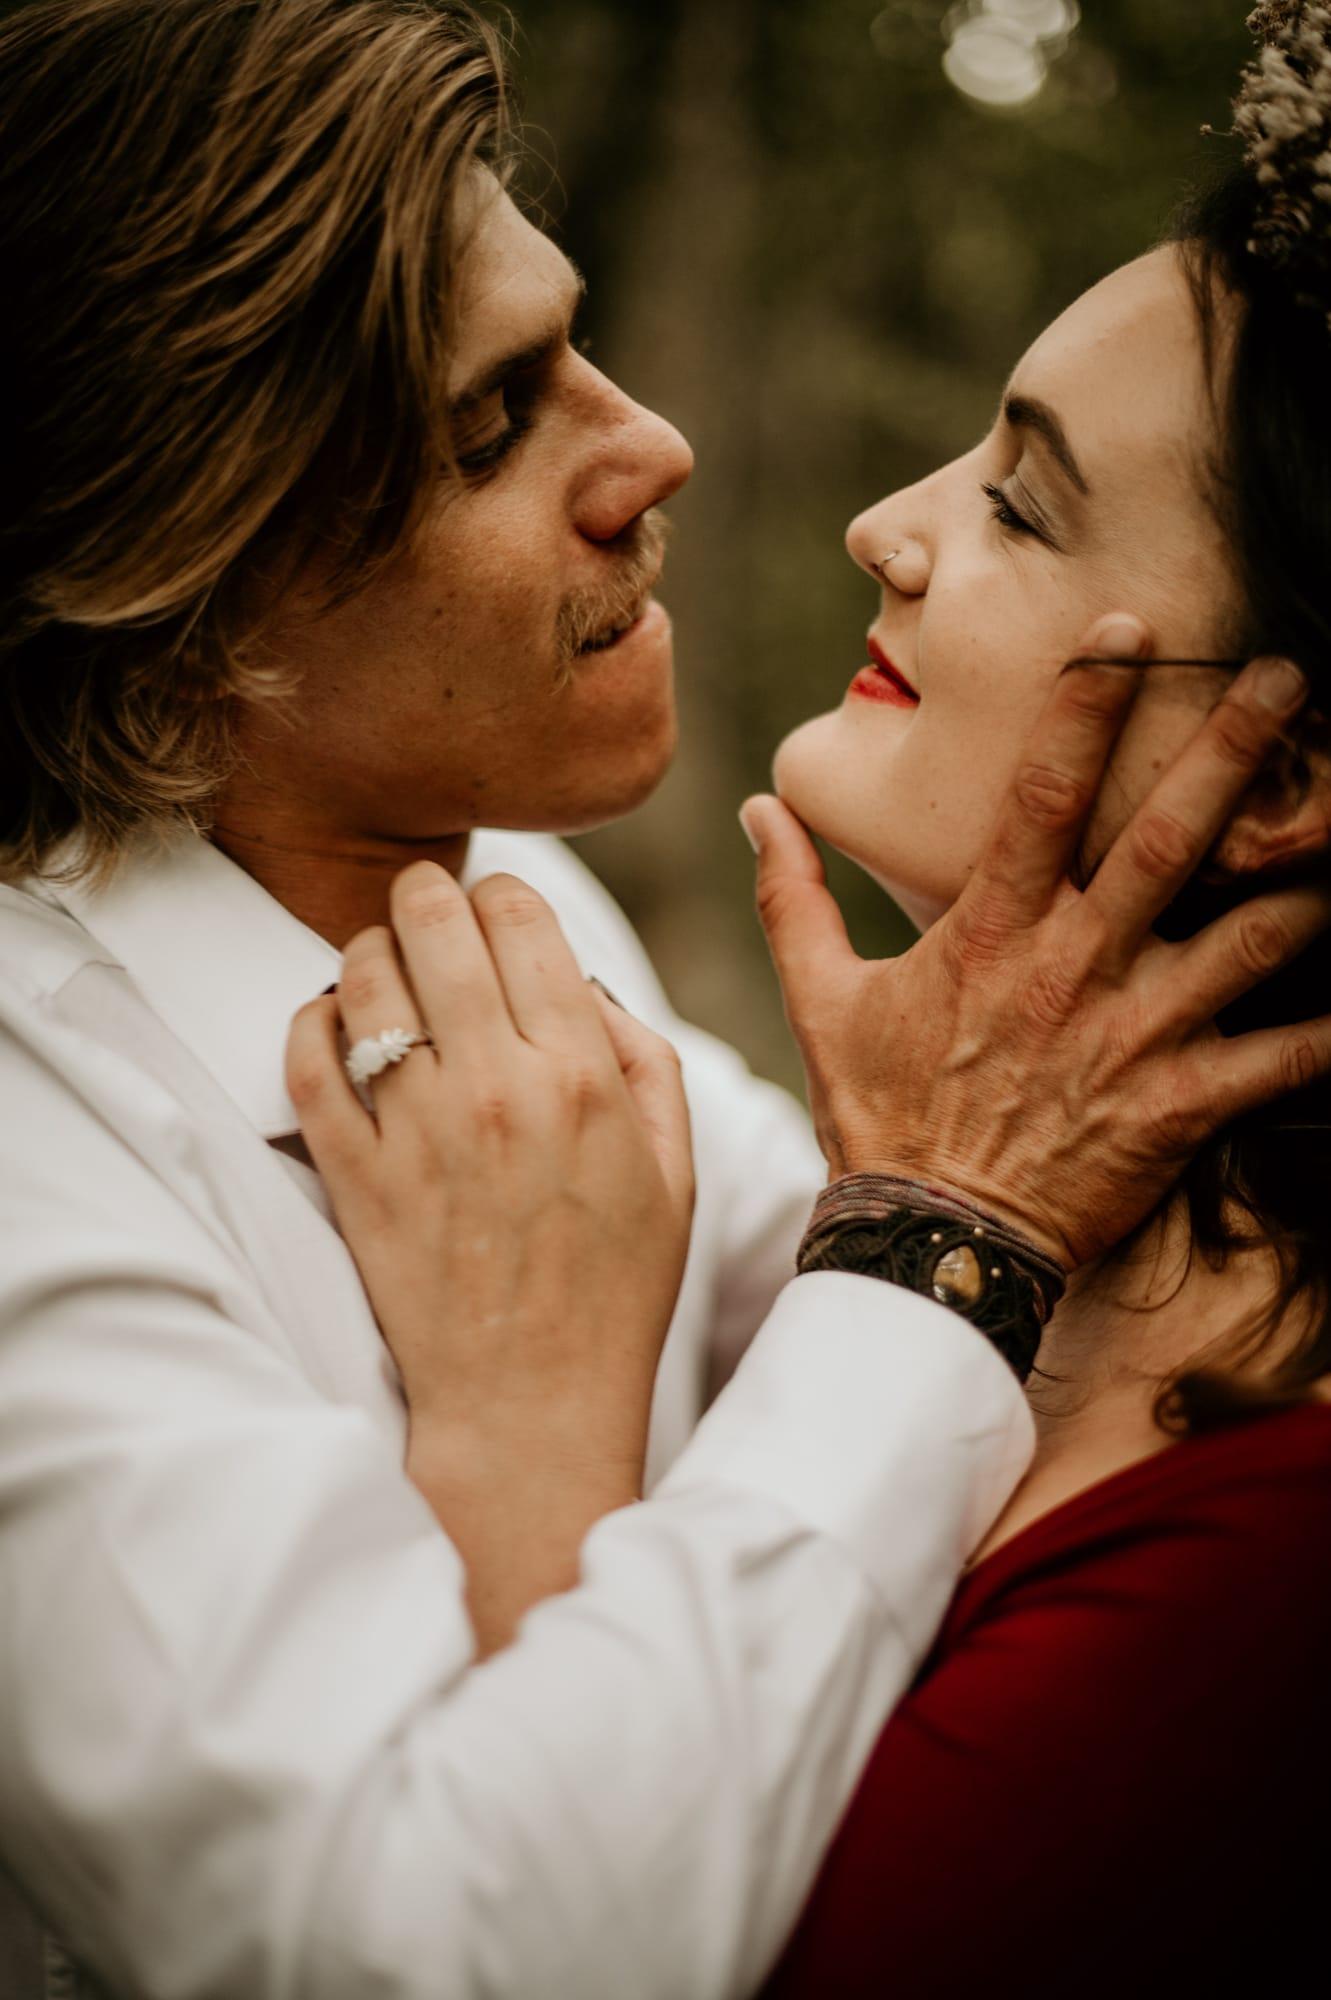 wesley-lanie-george-fernridge-engagement-June-Richards-Photography-Destination-Weddings-Elopements-Garden-Route-38